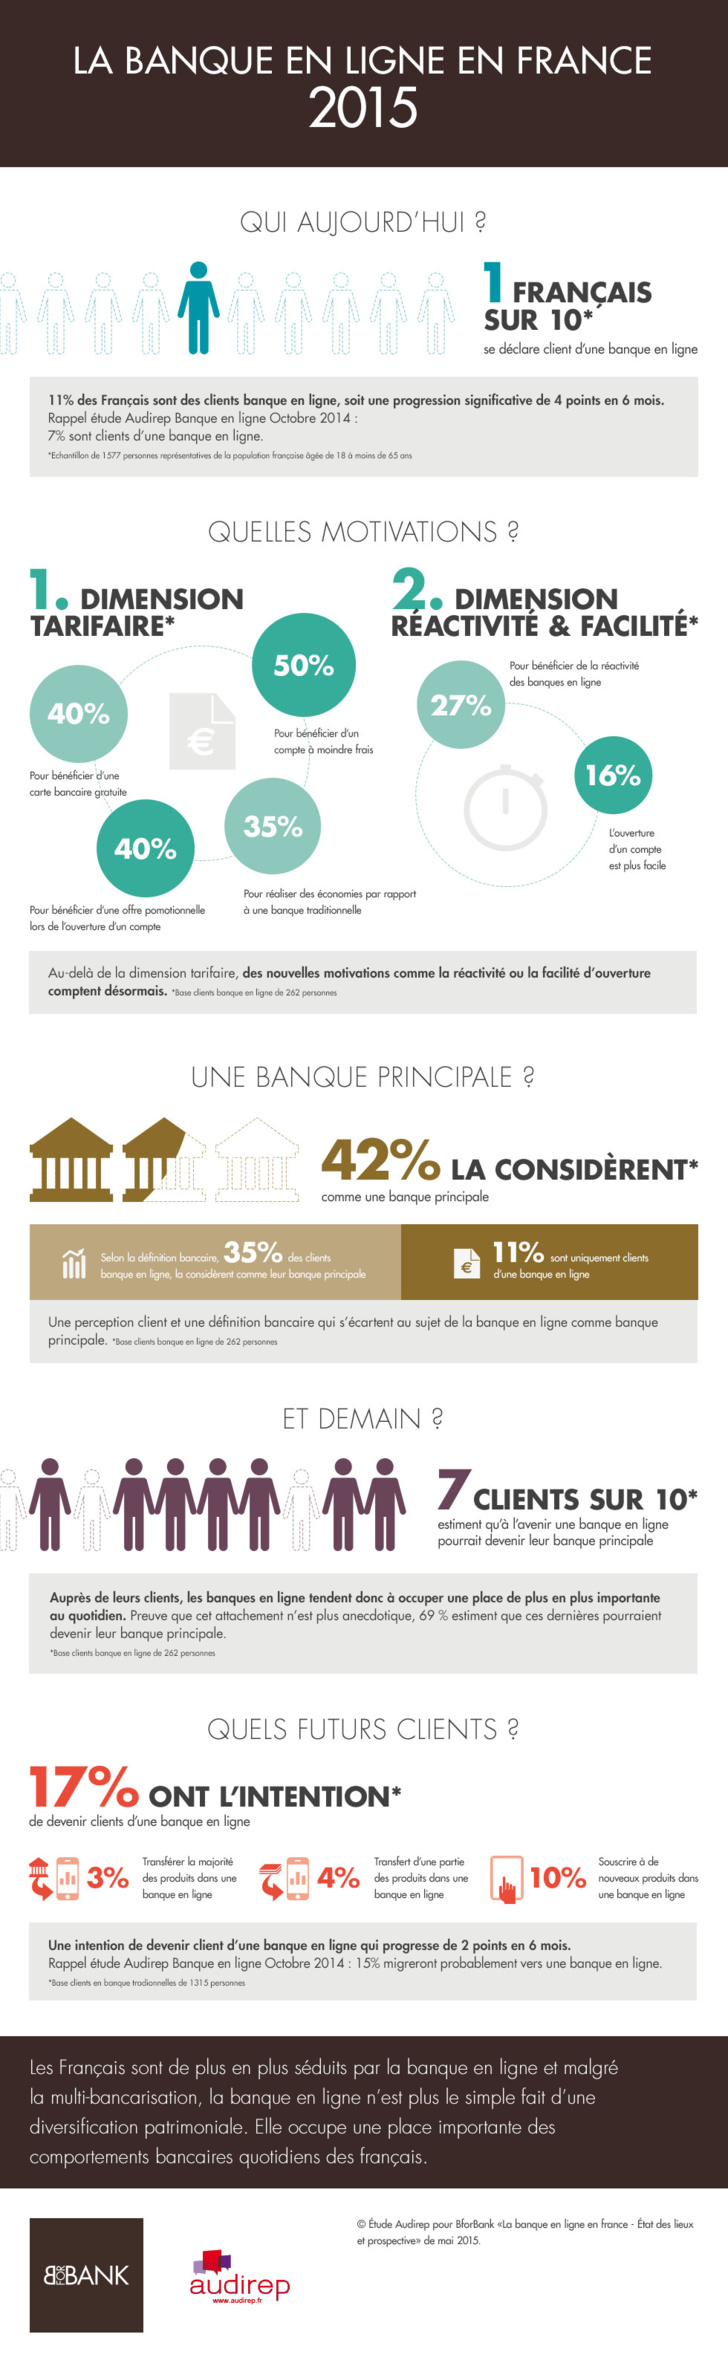 La banque en ligne en France - 2015